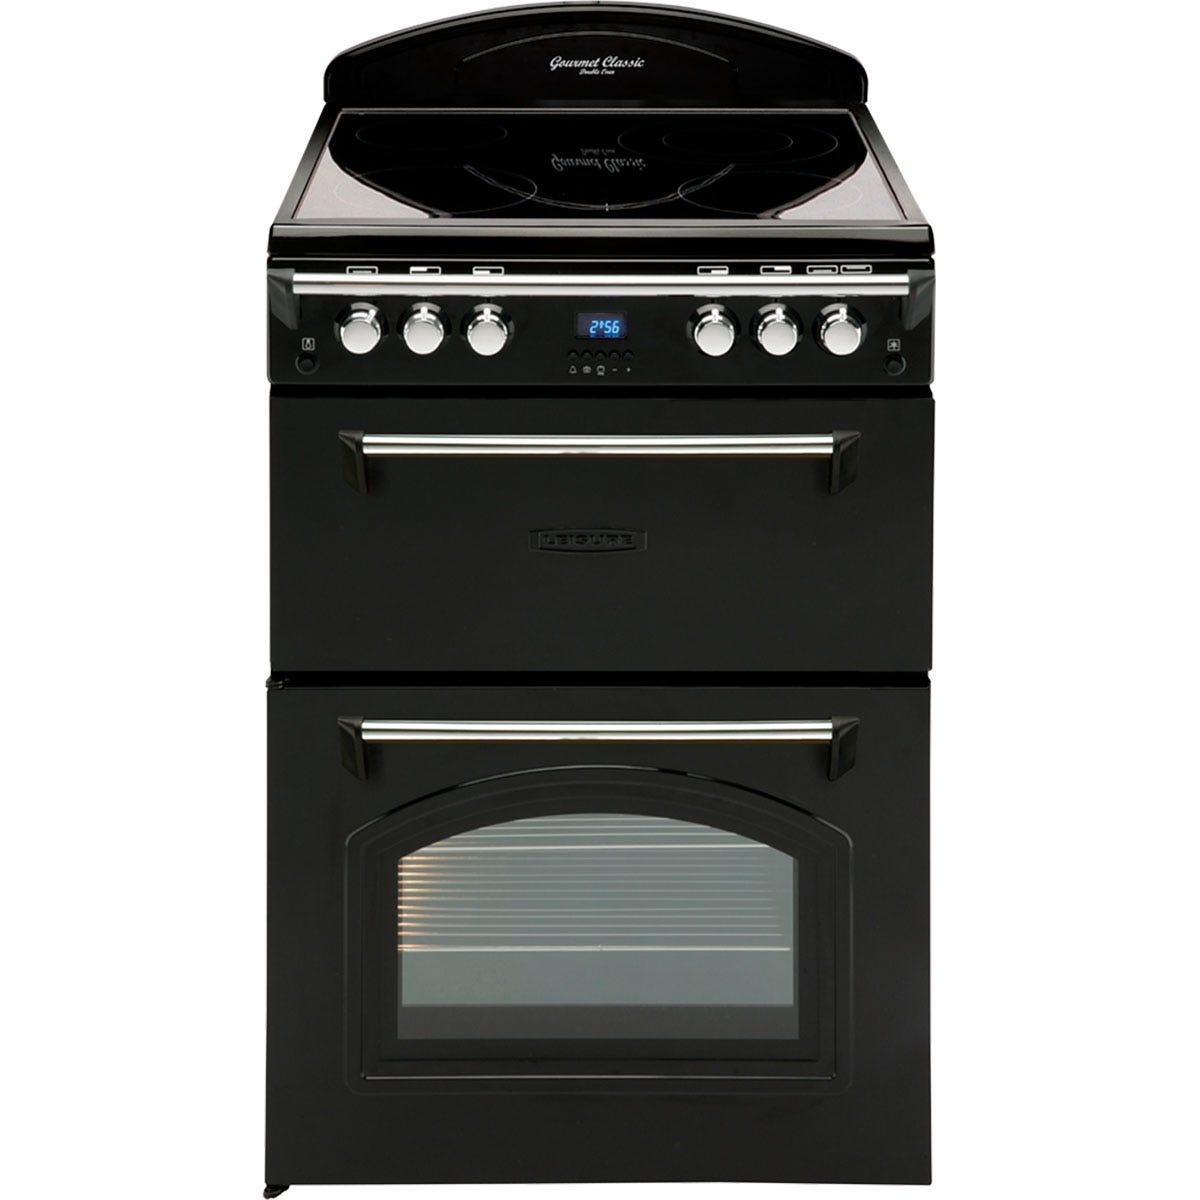 Leisure GRB6CVK Gourmet Range-Style 60cm Electric Cooker - Black